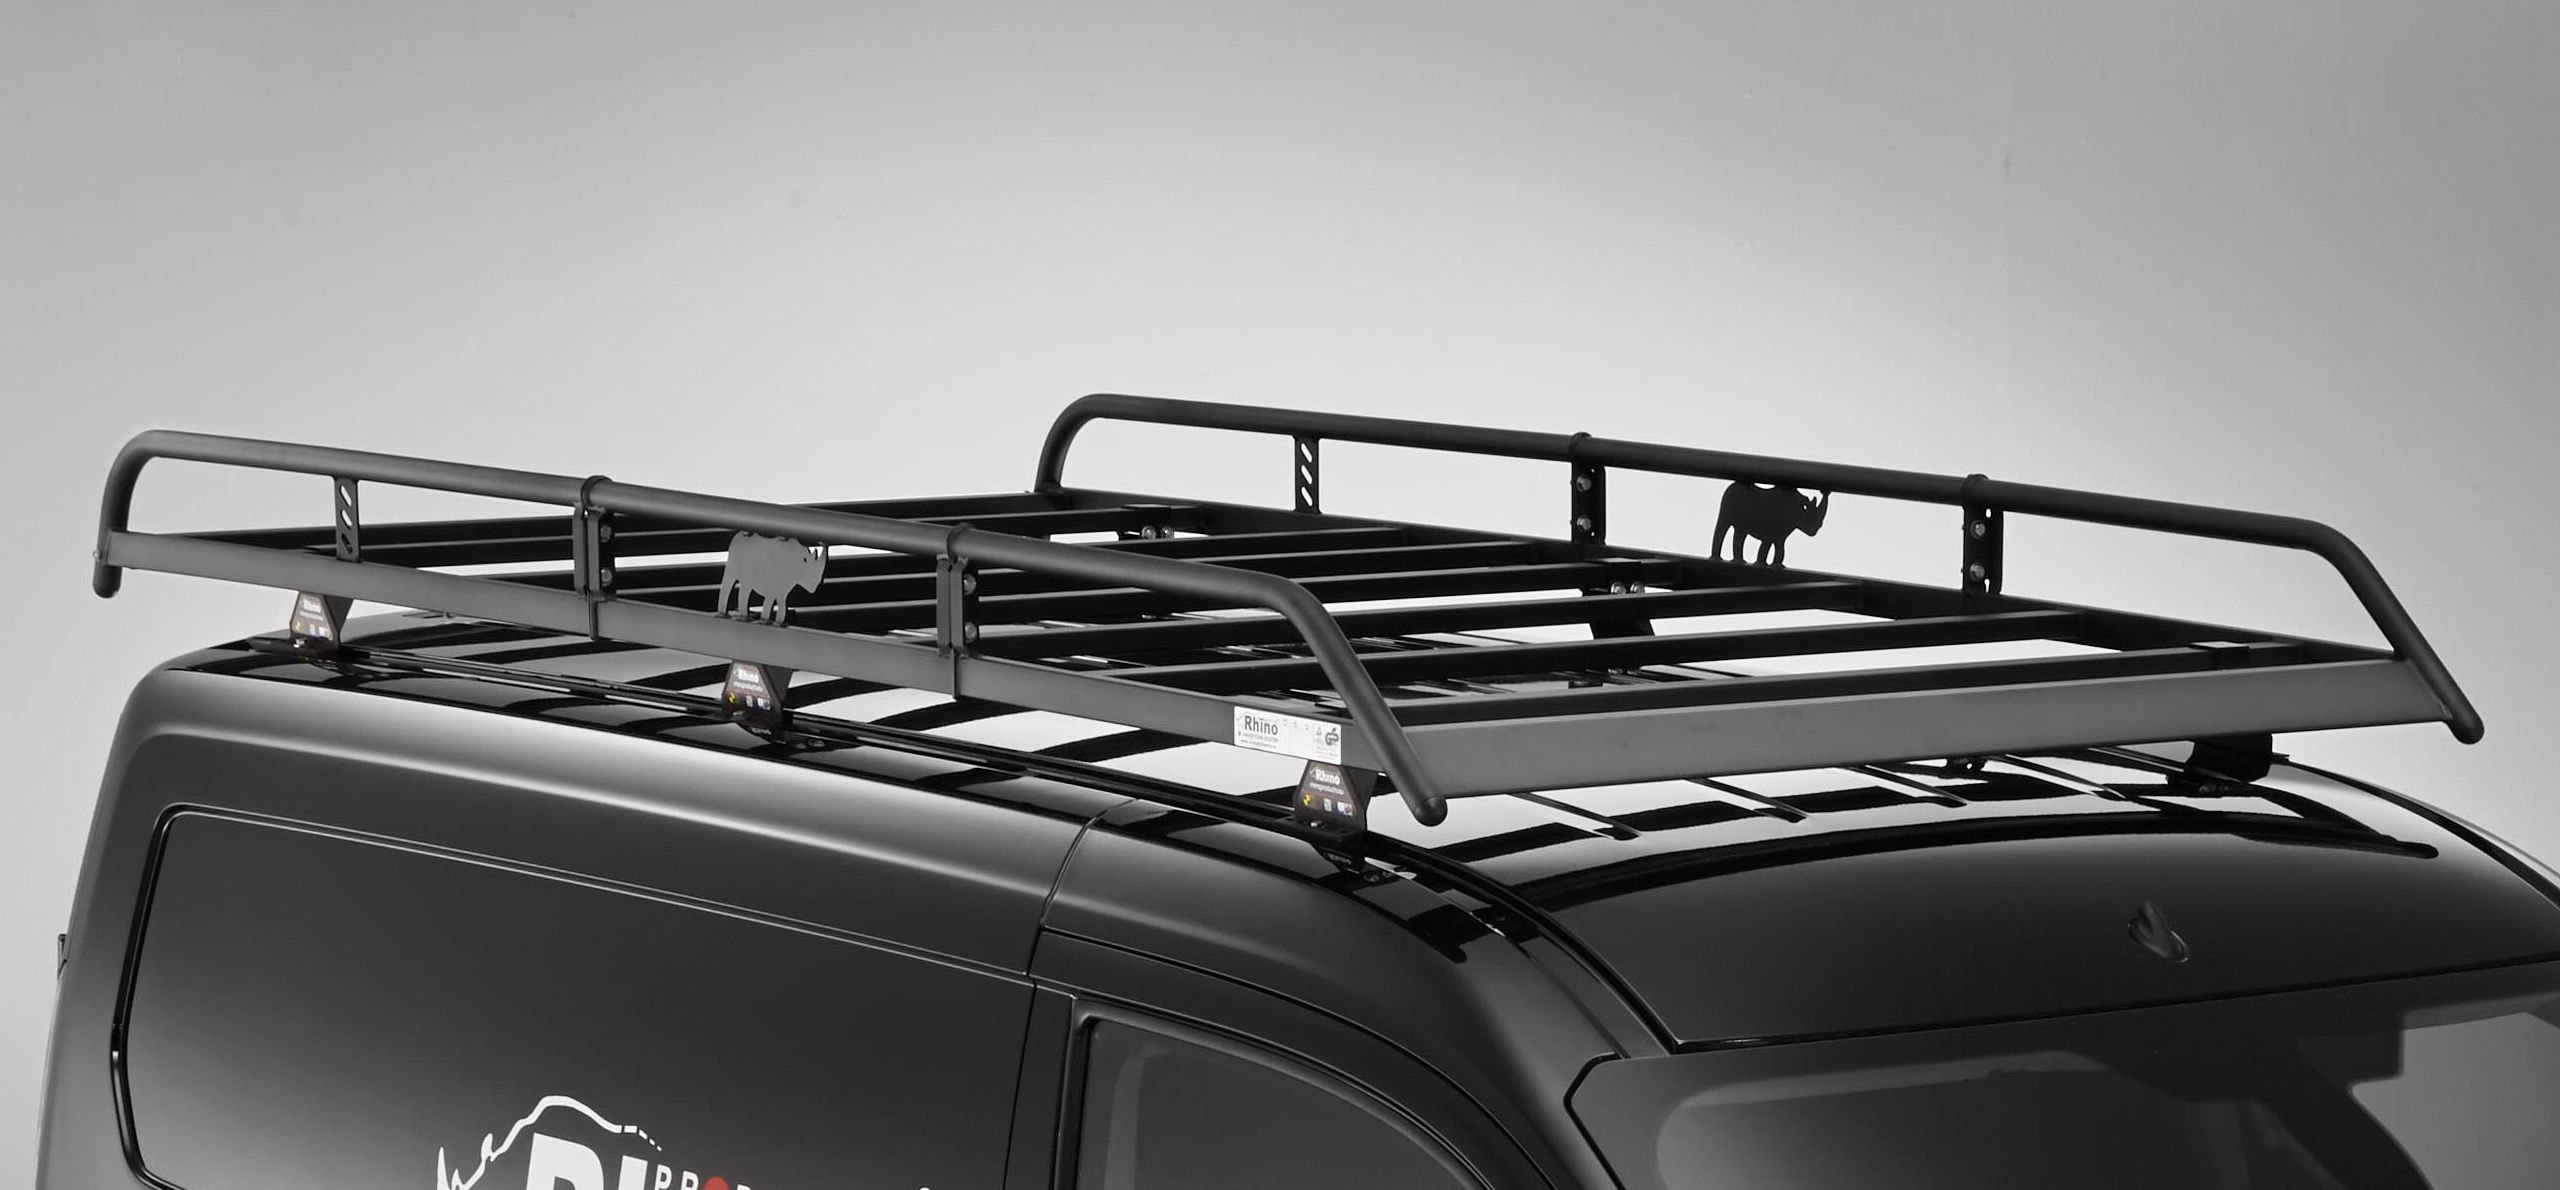 Rhino Modular Heavy Duty Roof Rack For Ford Transit 2014